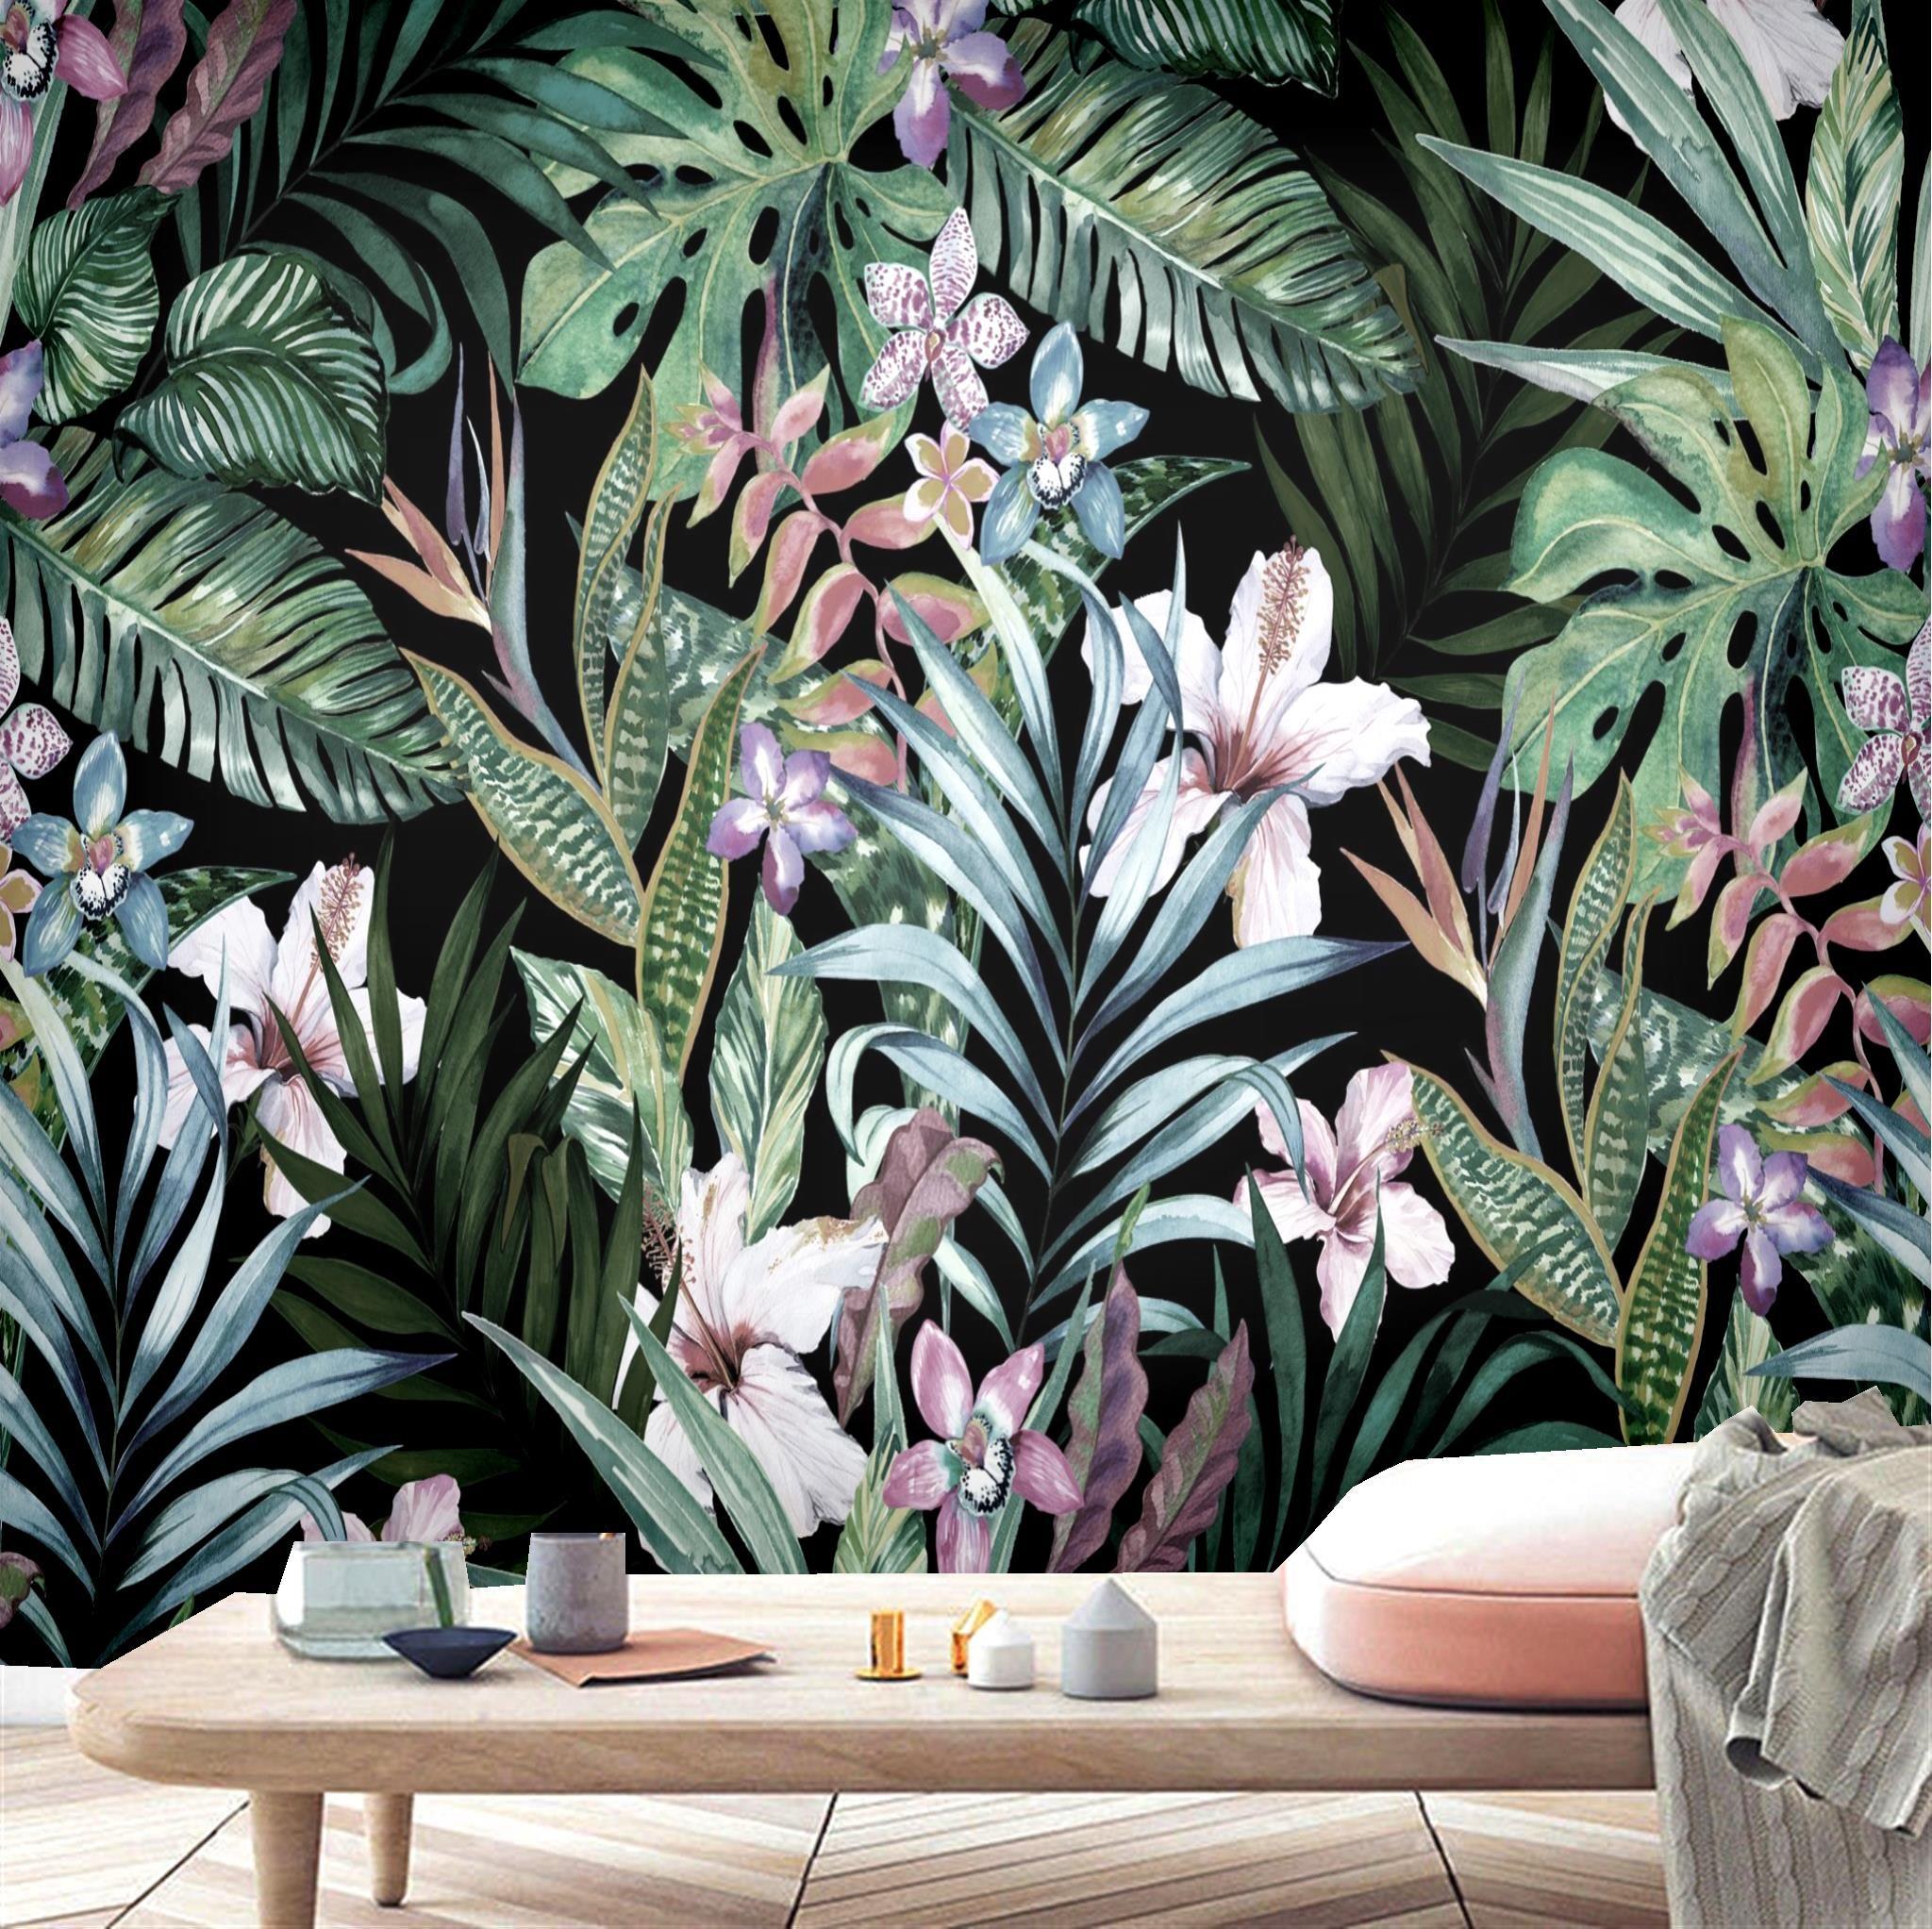 Wallpaper AL-Mulk Custom Wallpaper Mural Self-adhesive Black Background Flower Leaf Forest FQ226 Pastoral Interior Decoration 3D